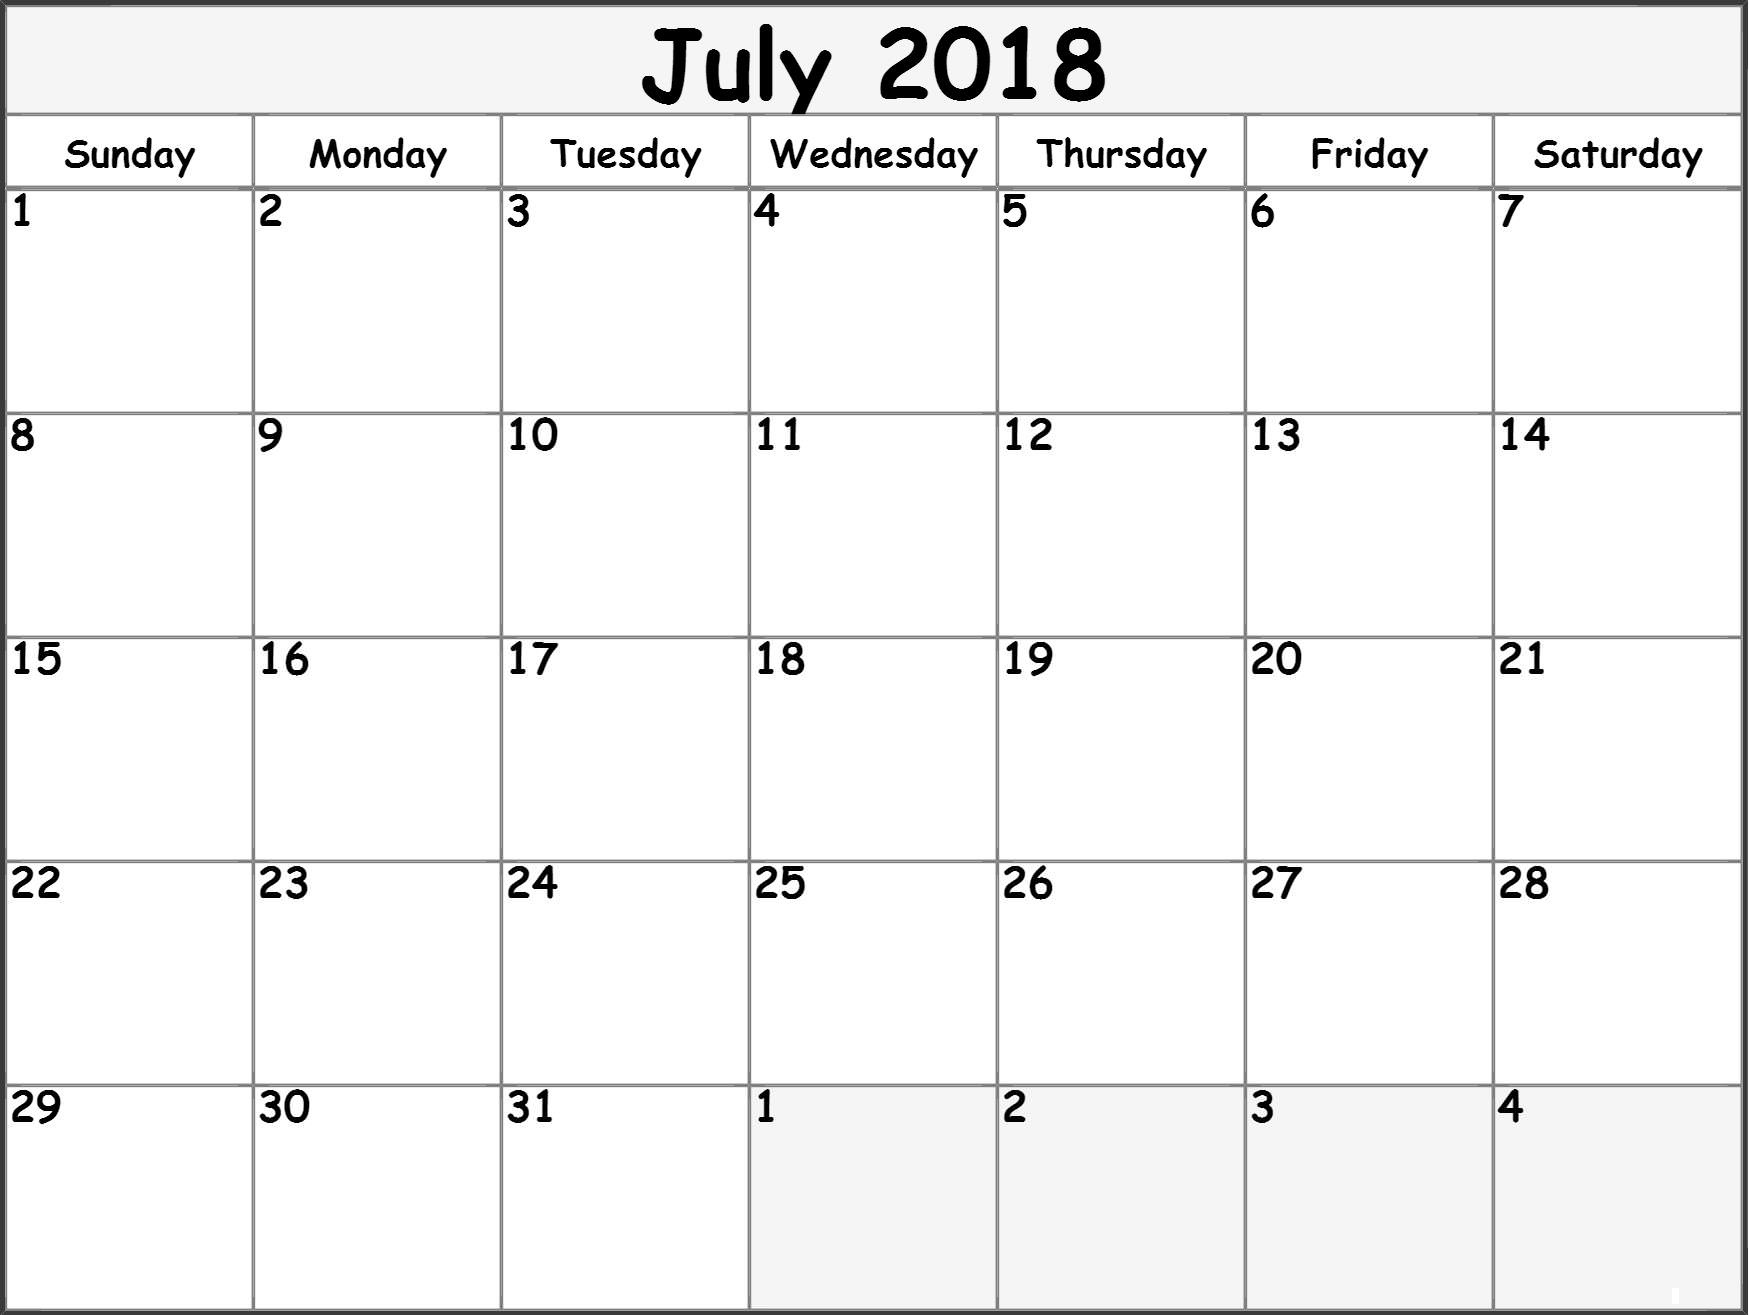 July 2018 Blank Calendars